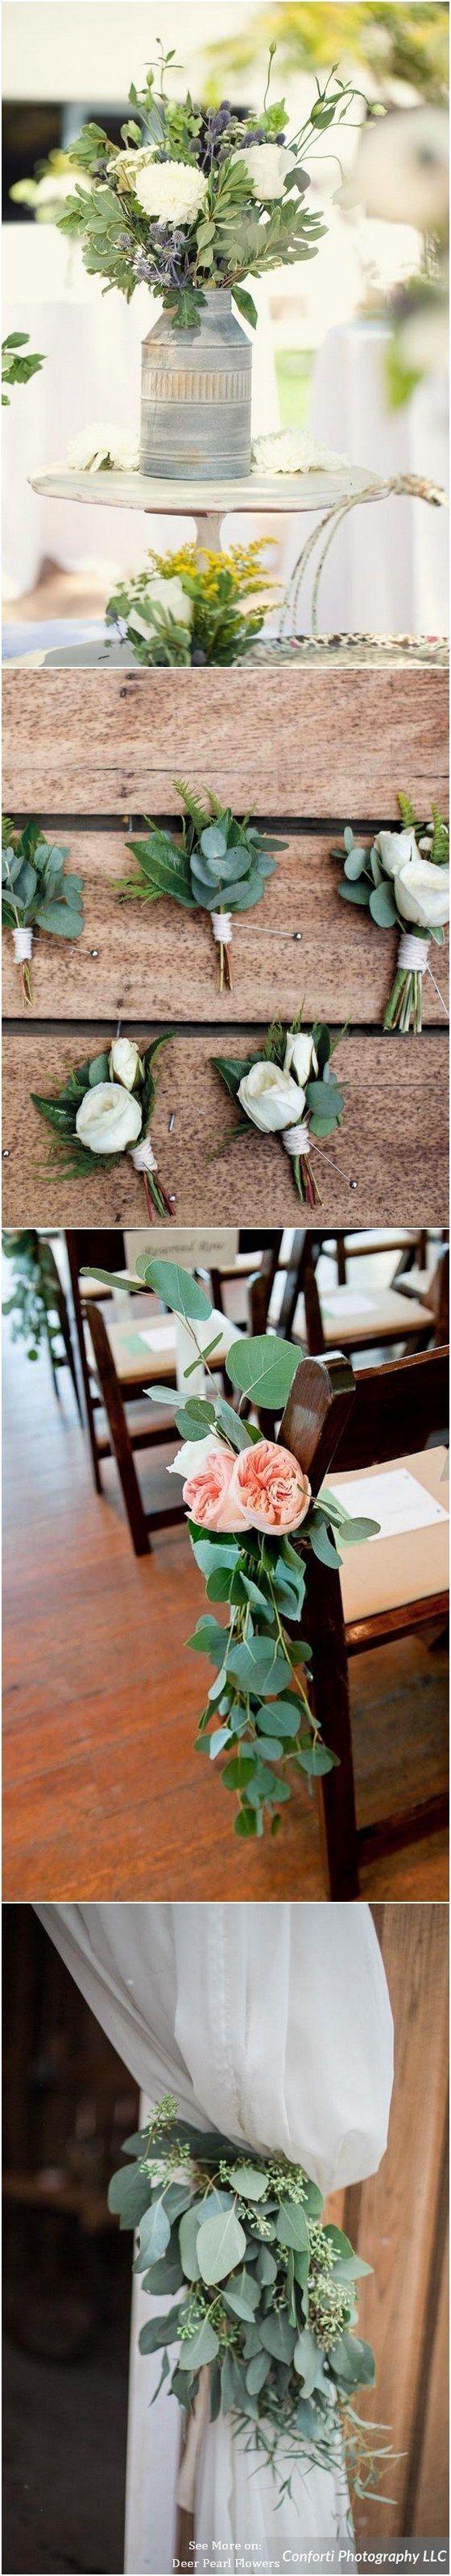 Wedding theme ideas by color  Eucalyptus green wedding color ideas  erpearlflowers